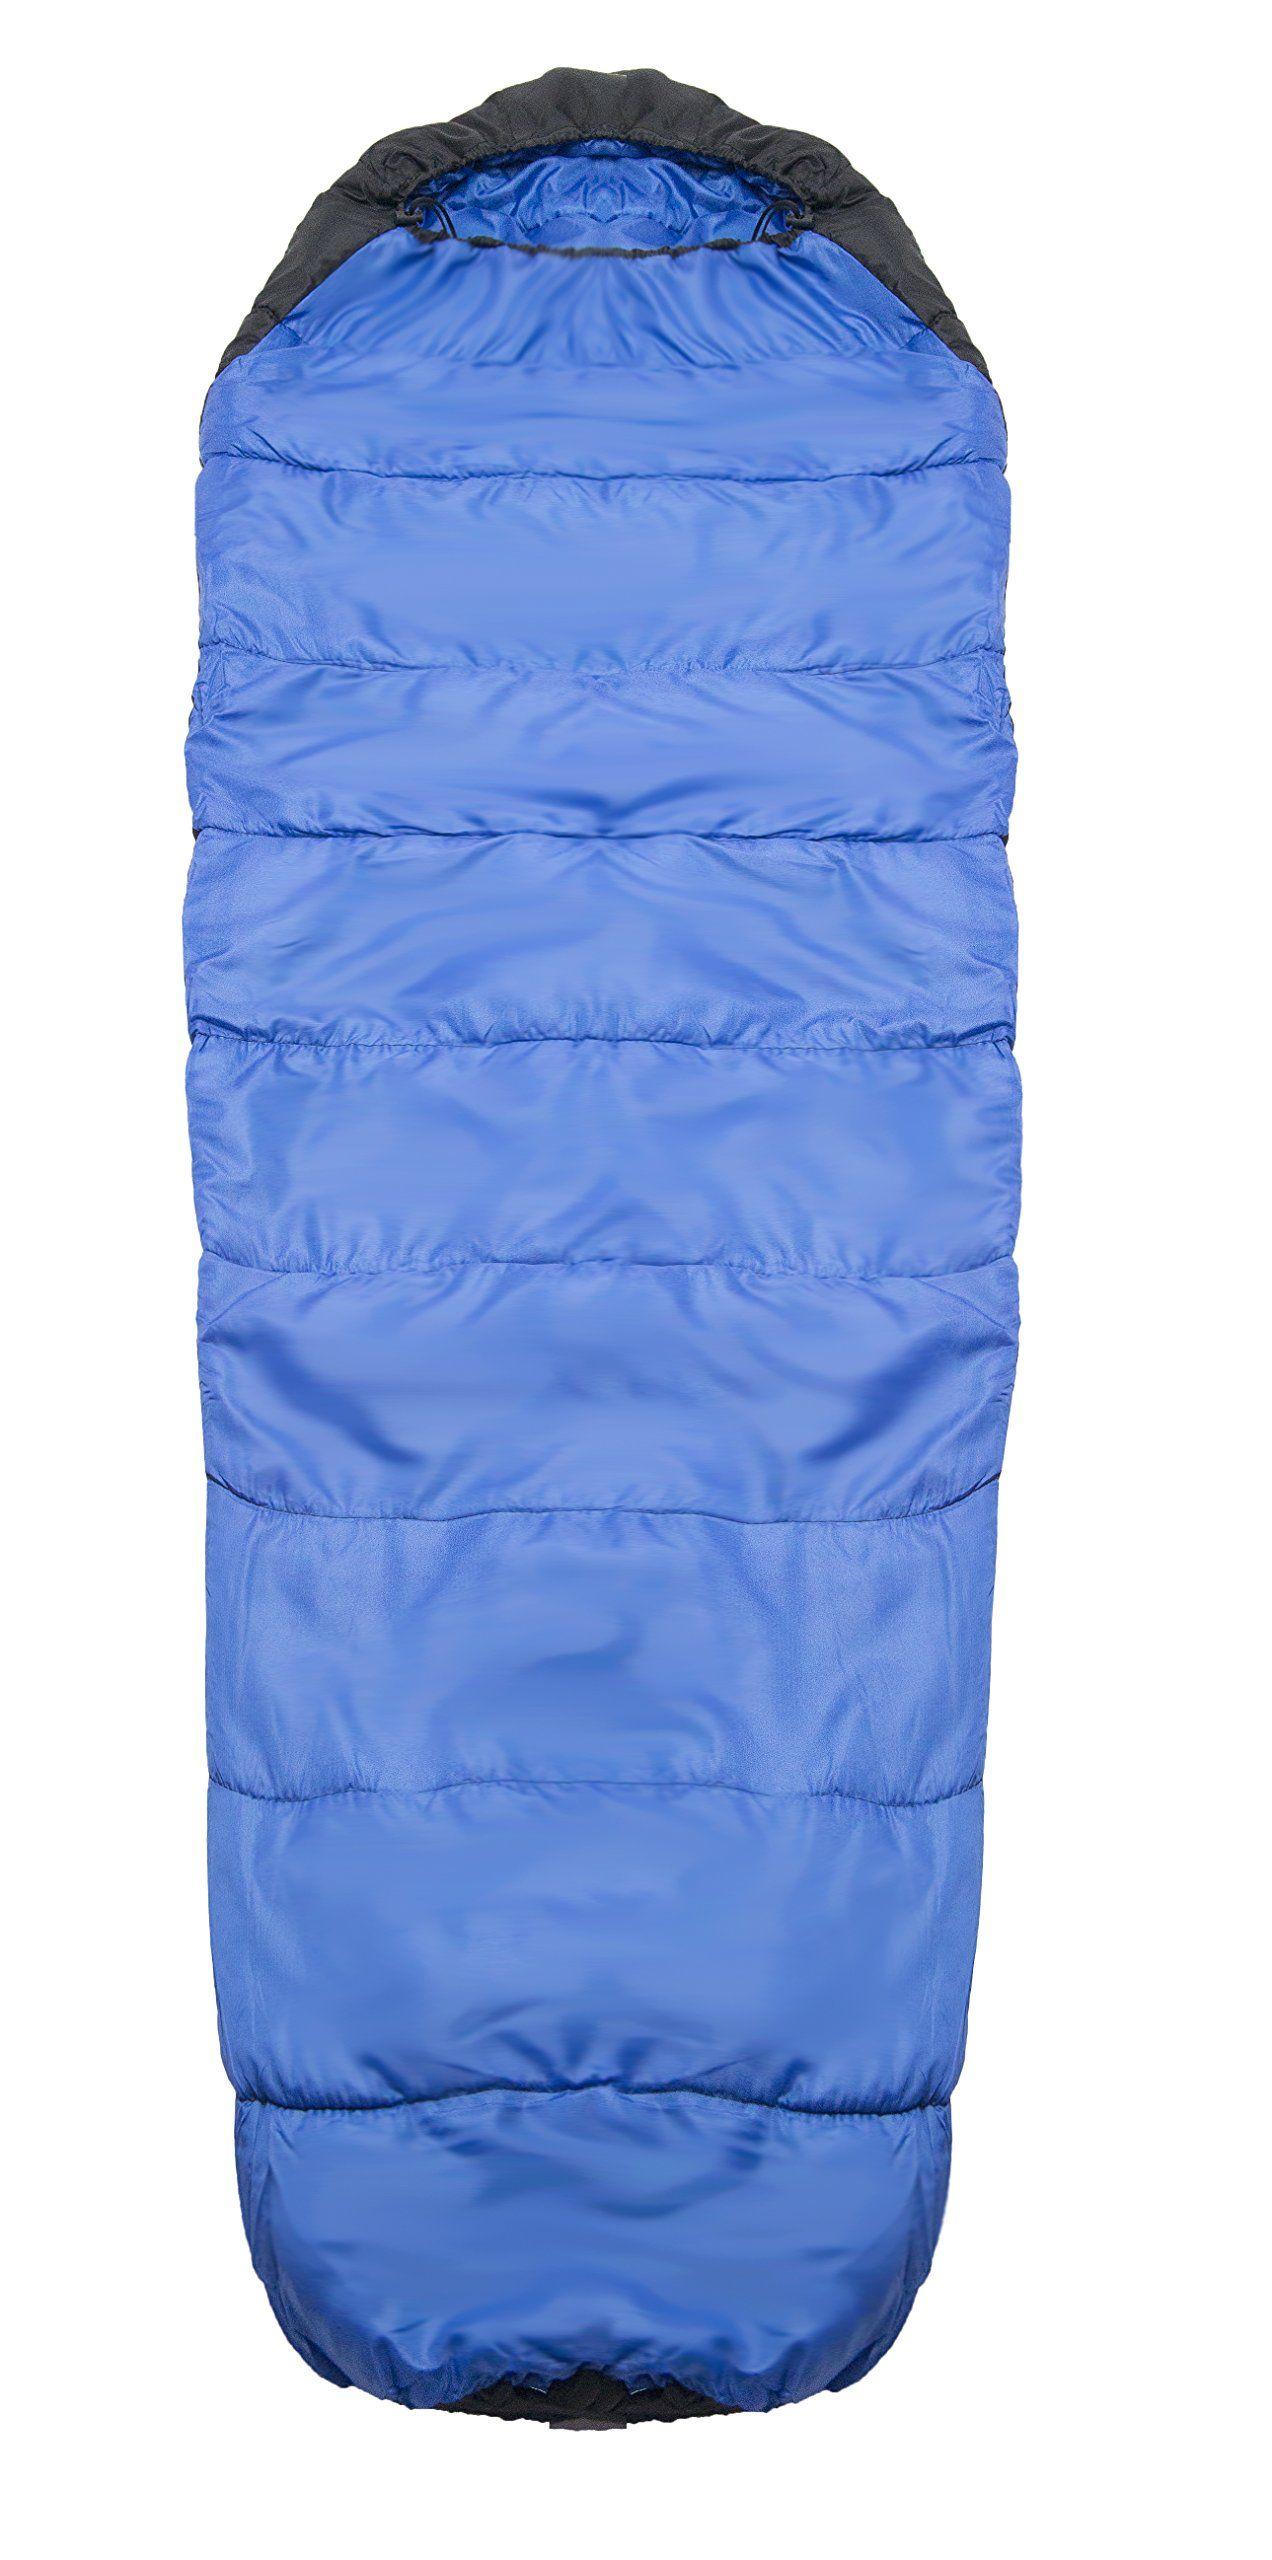 World Famous Sports 15 Degree Mummy Sleeping Bag 91 X 32 Or Fits